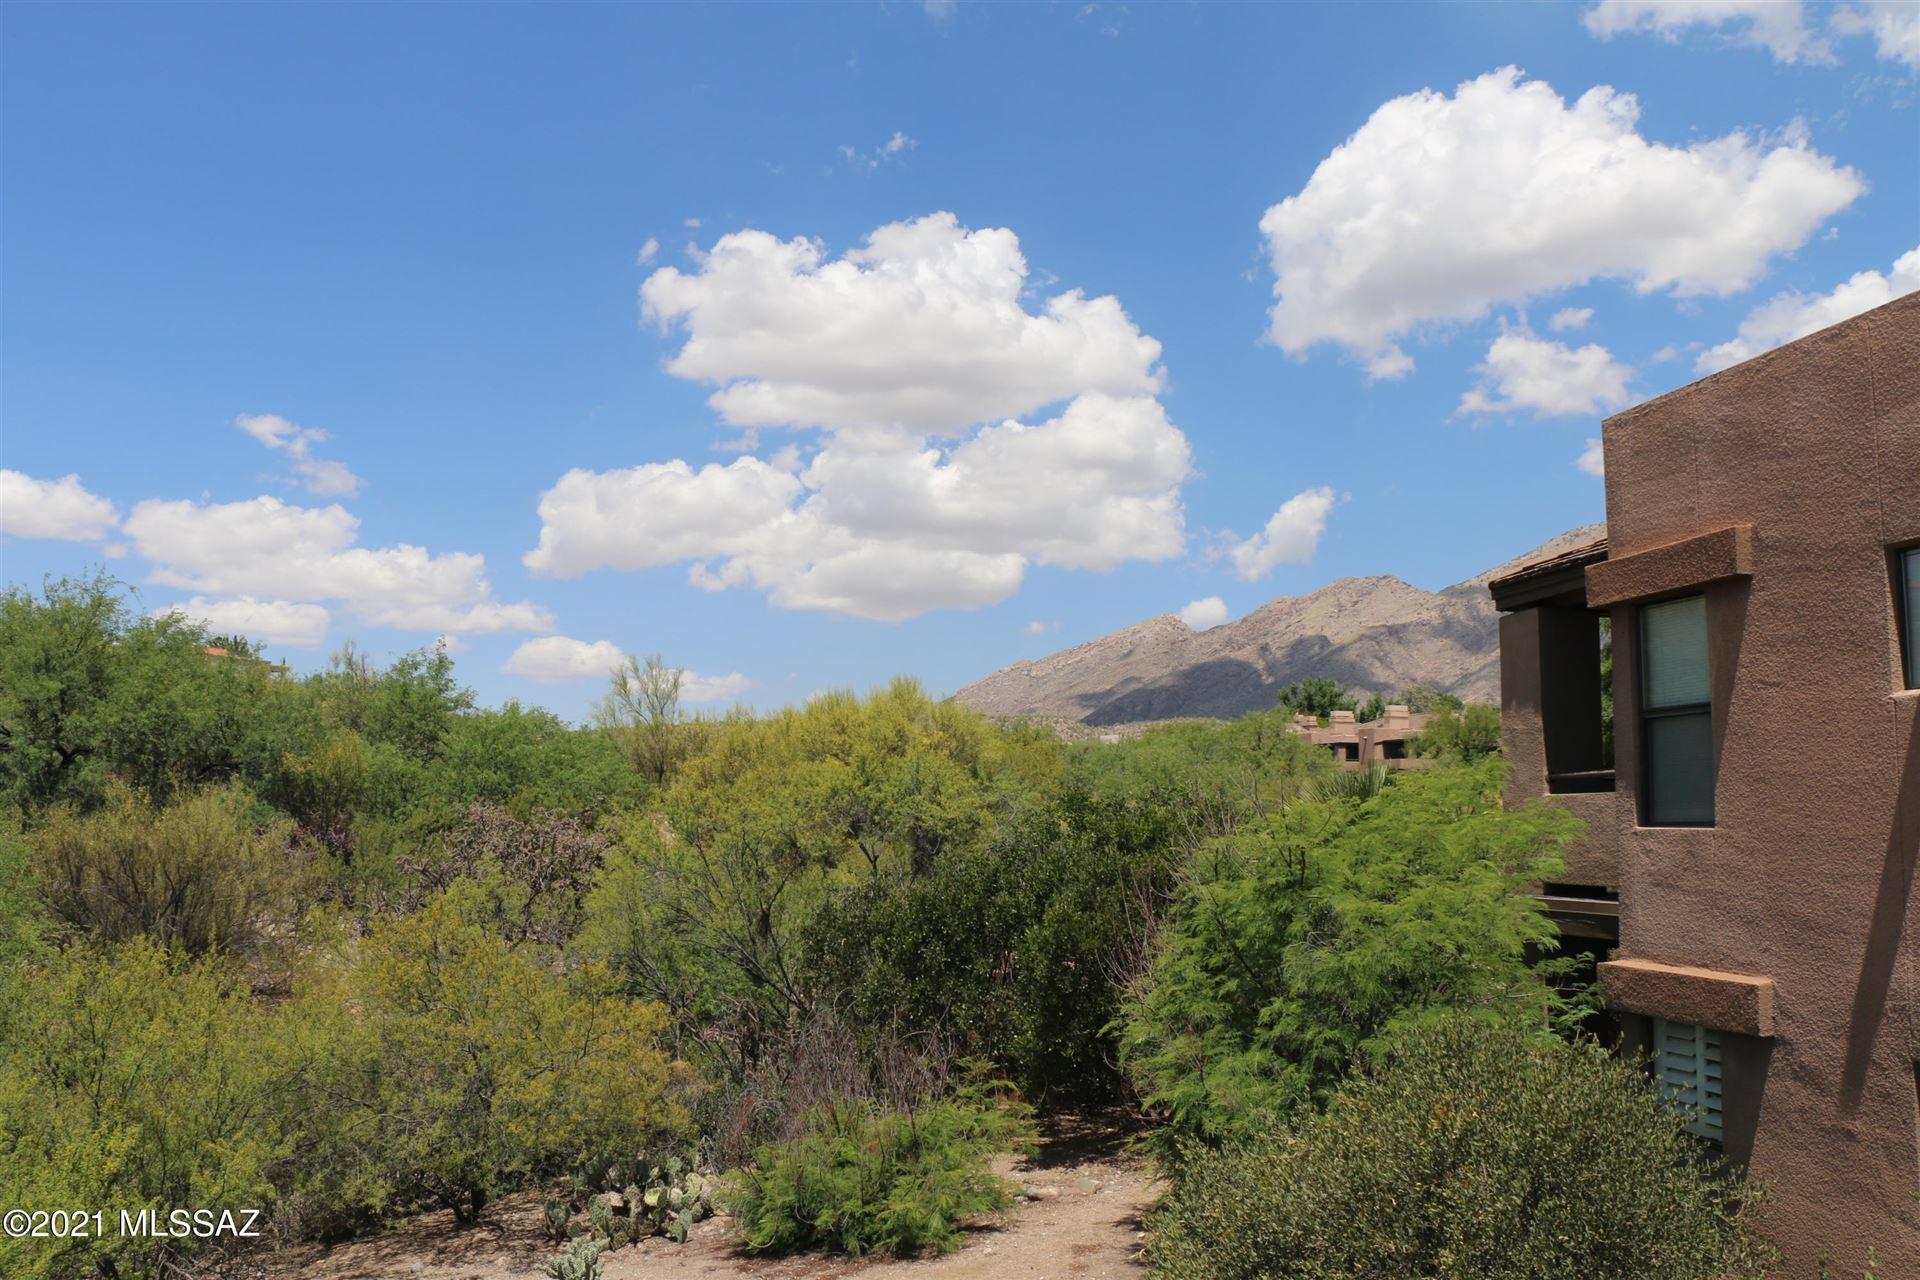 5855 N Kolb Road #13208, Tucson, AZ 85750 - MLS#: 22117921